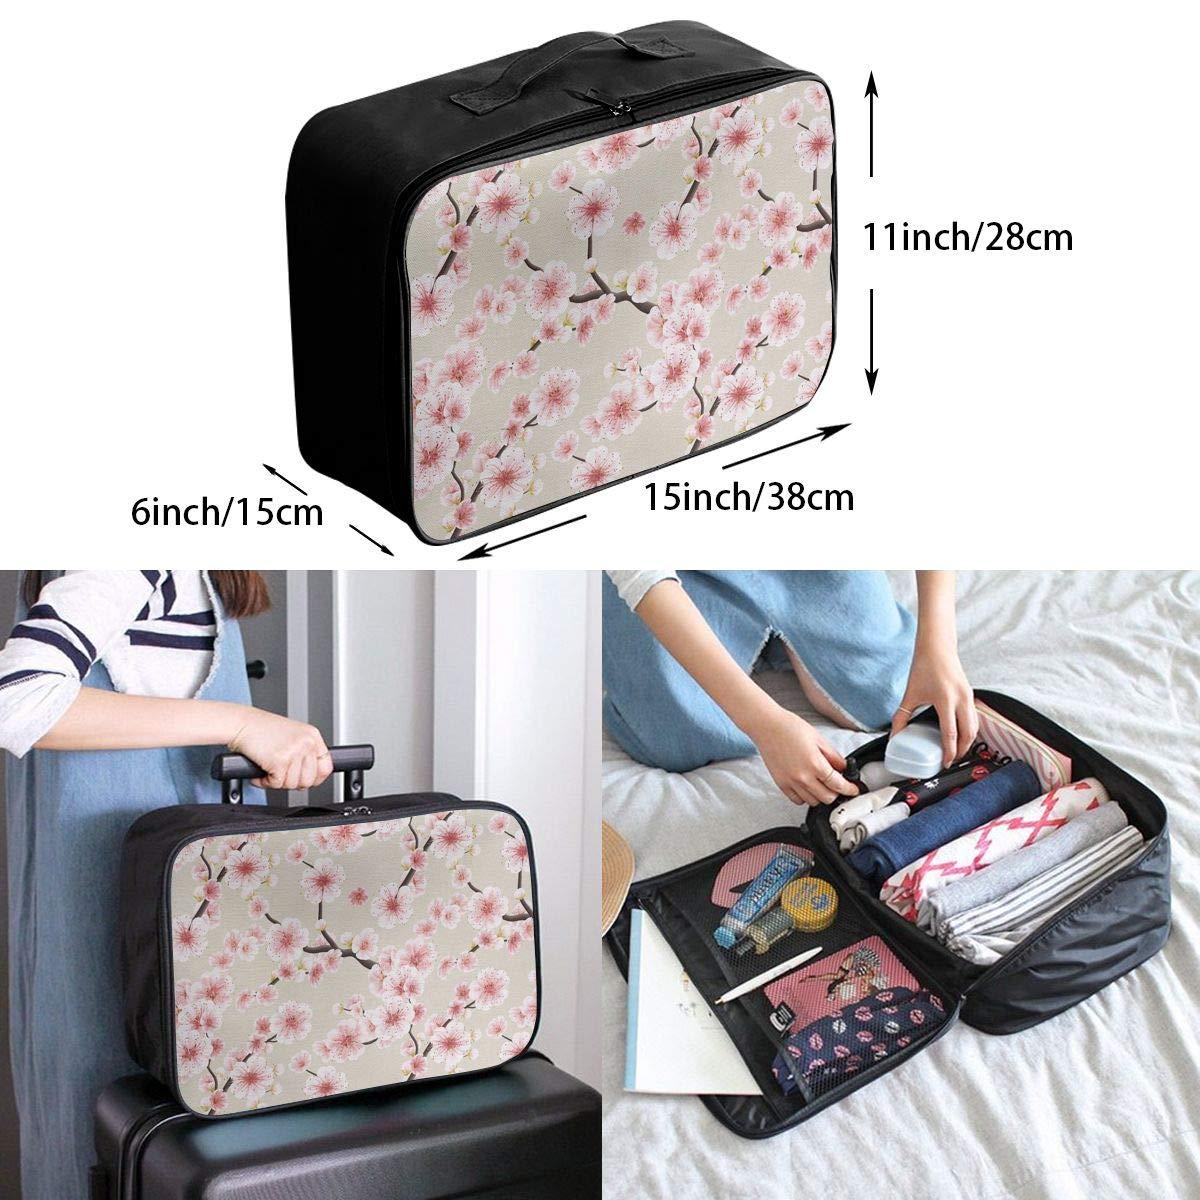 ADGAI Japanese Flowering Cherry Blossom Canvas Travel Weekender Bag,Fashion Custom Lightweight Large Capacity Portable Luggage Bag,Suitcase Trolley Bag